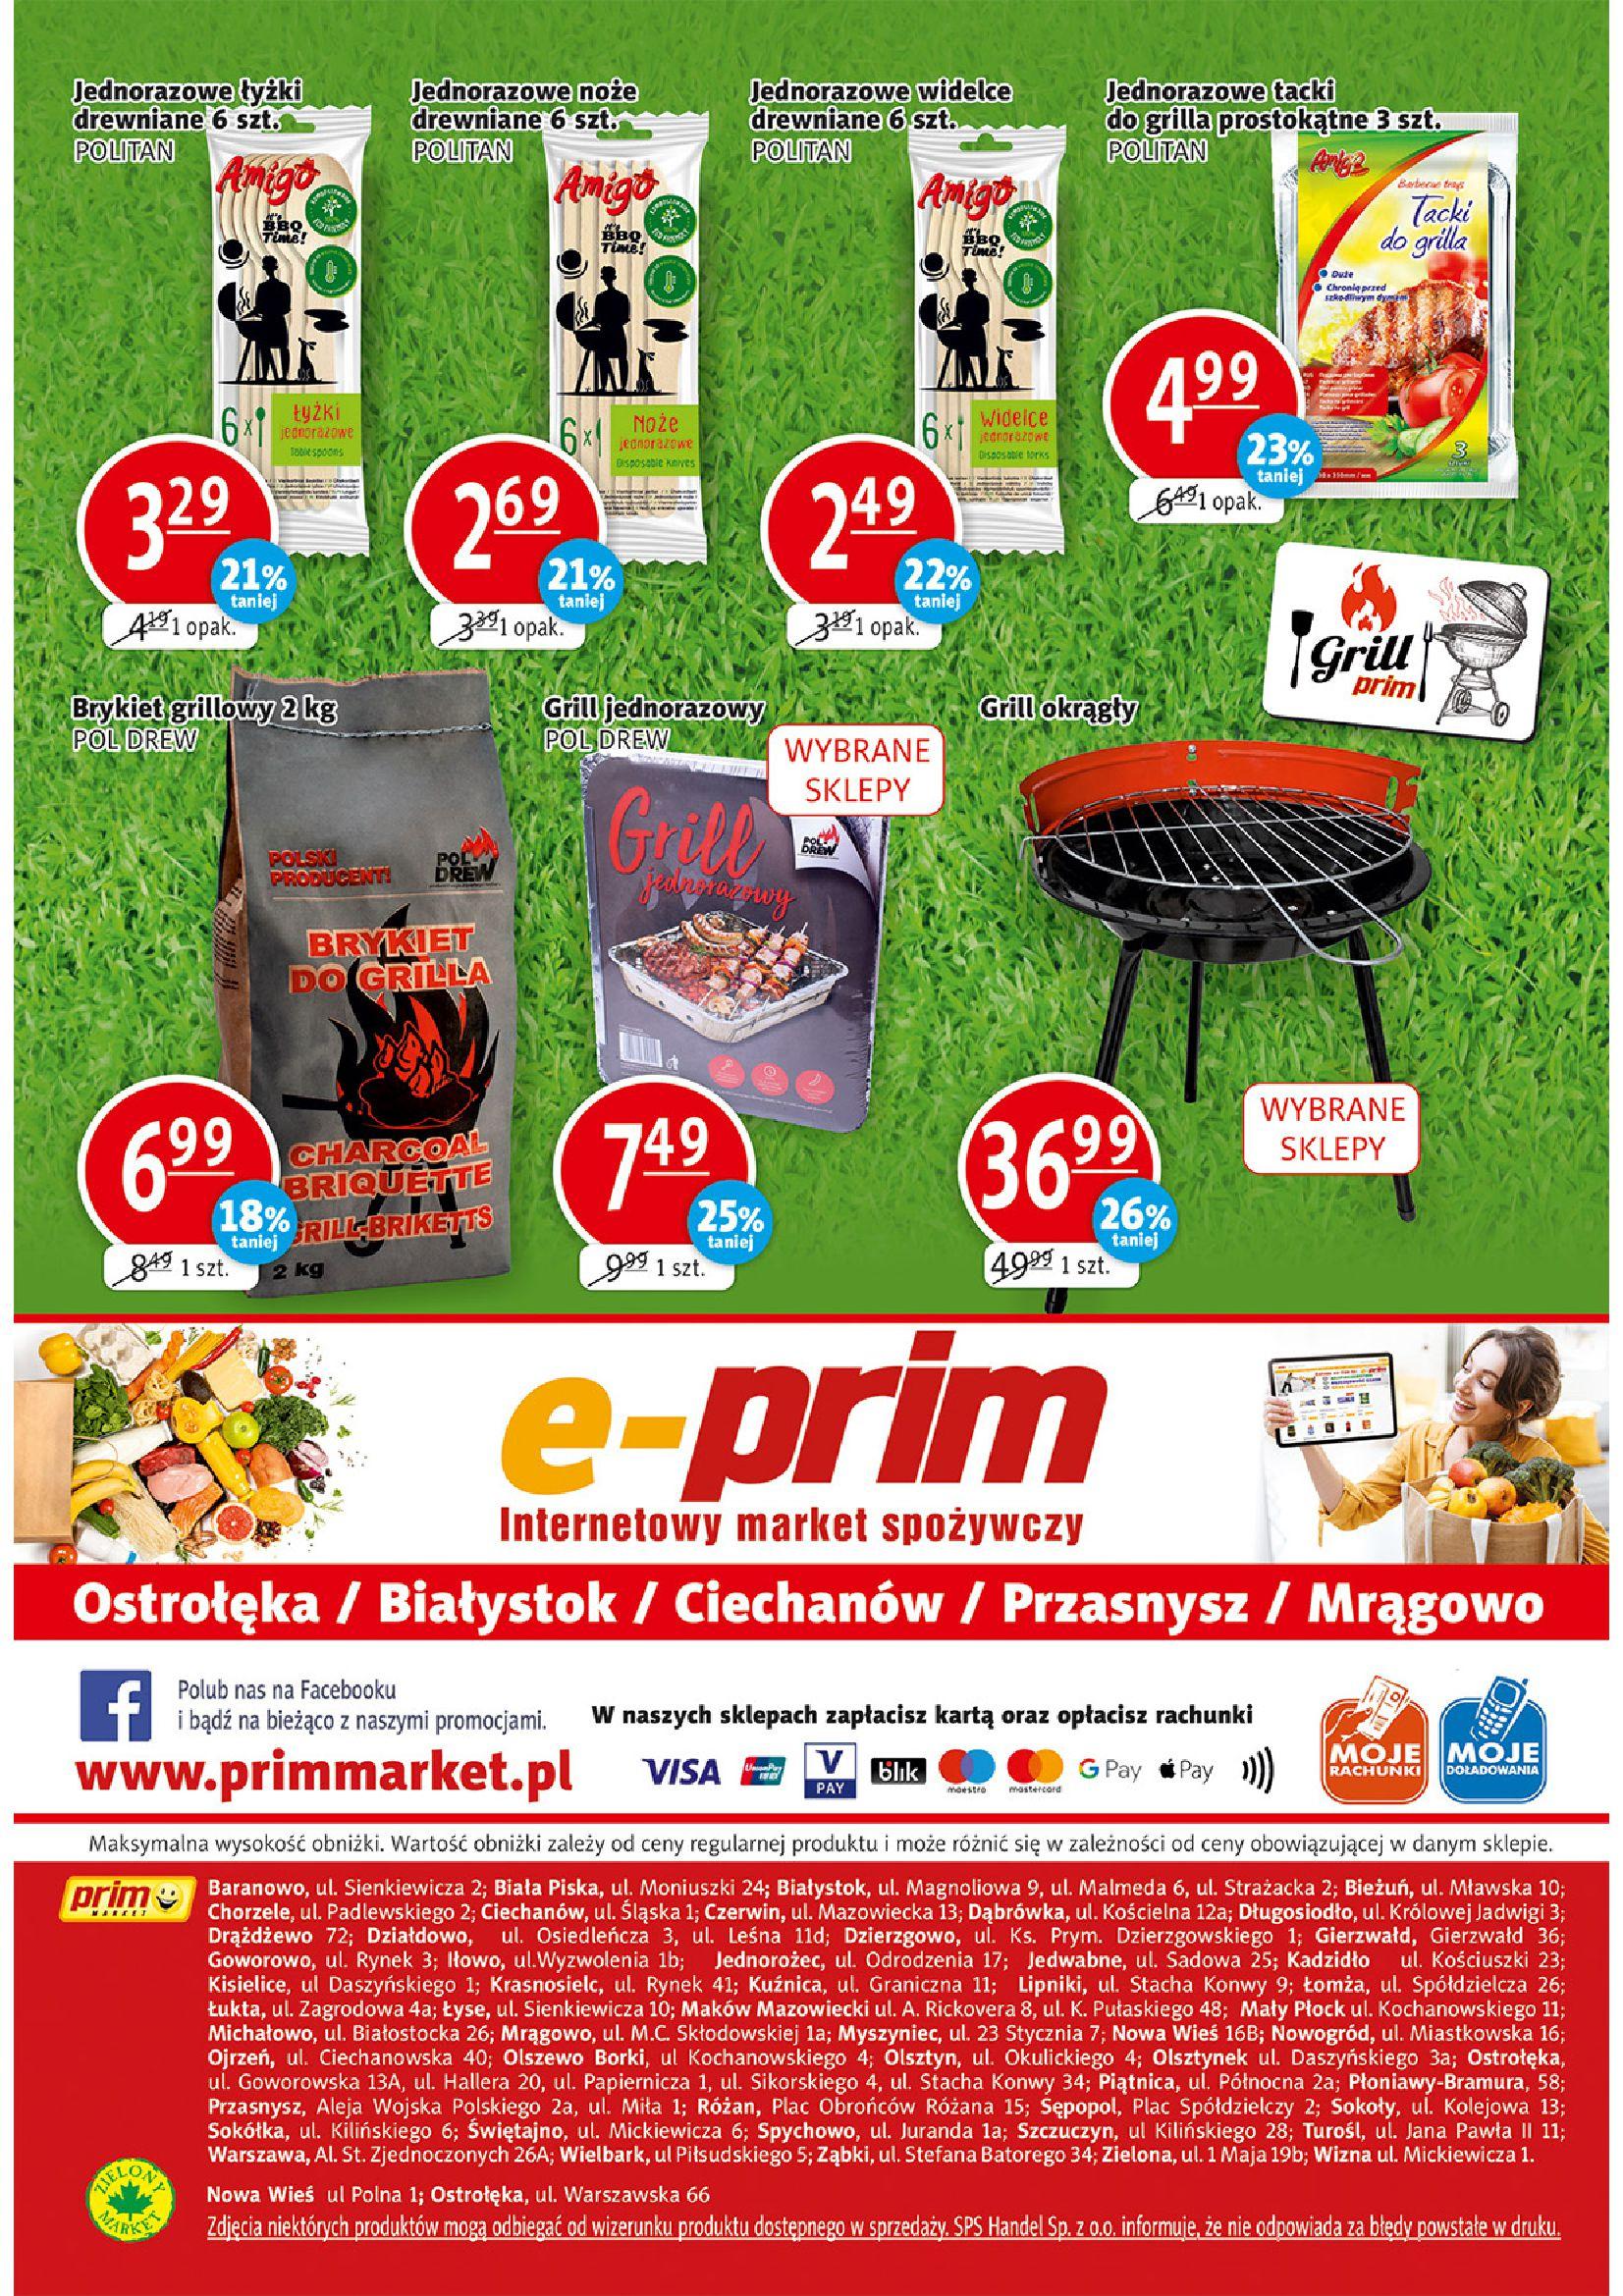 Gazetka PRIM MARKET: Gazetka PRIM MARKET 22-28.07 2021-07-22 page-16